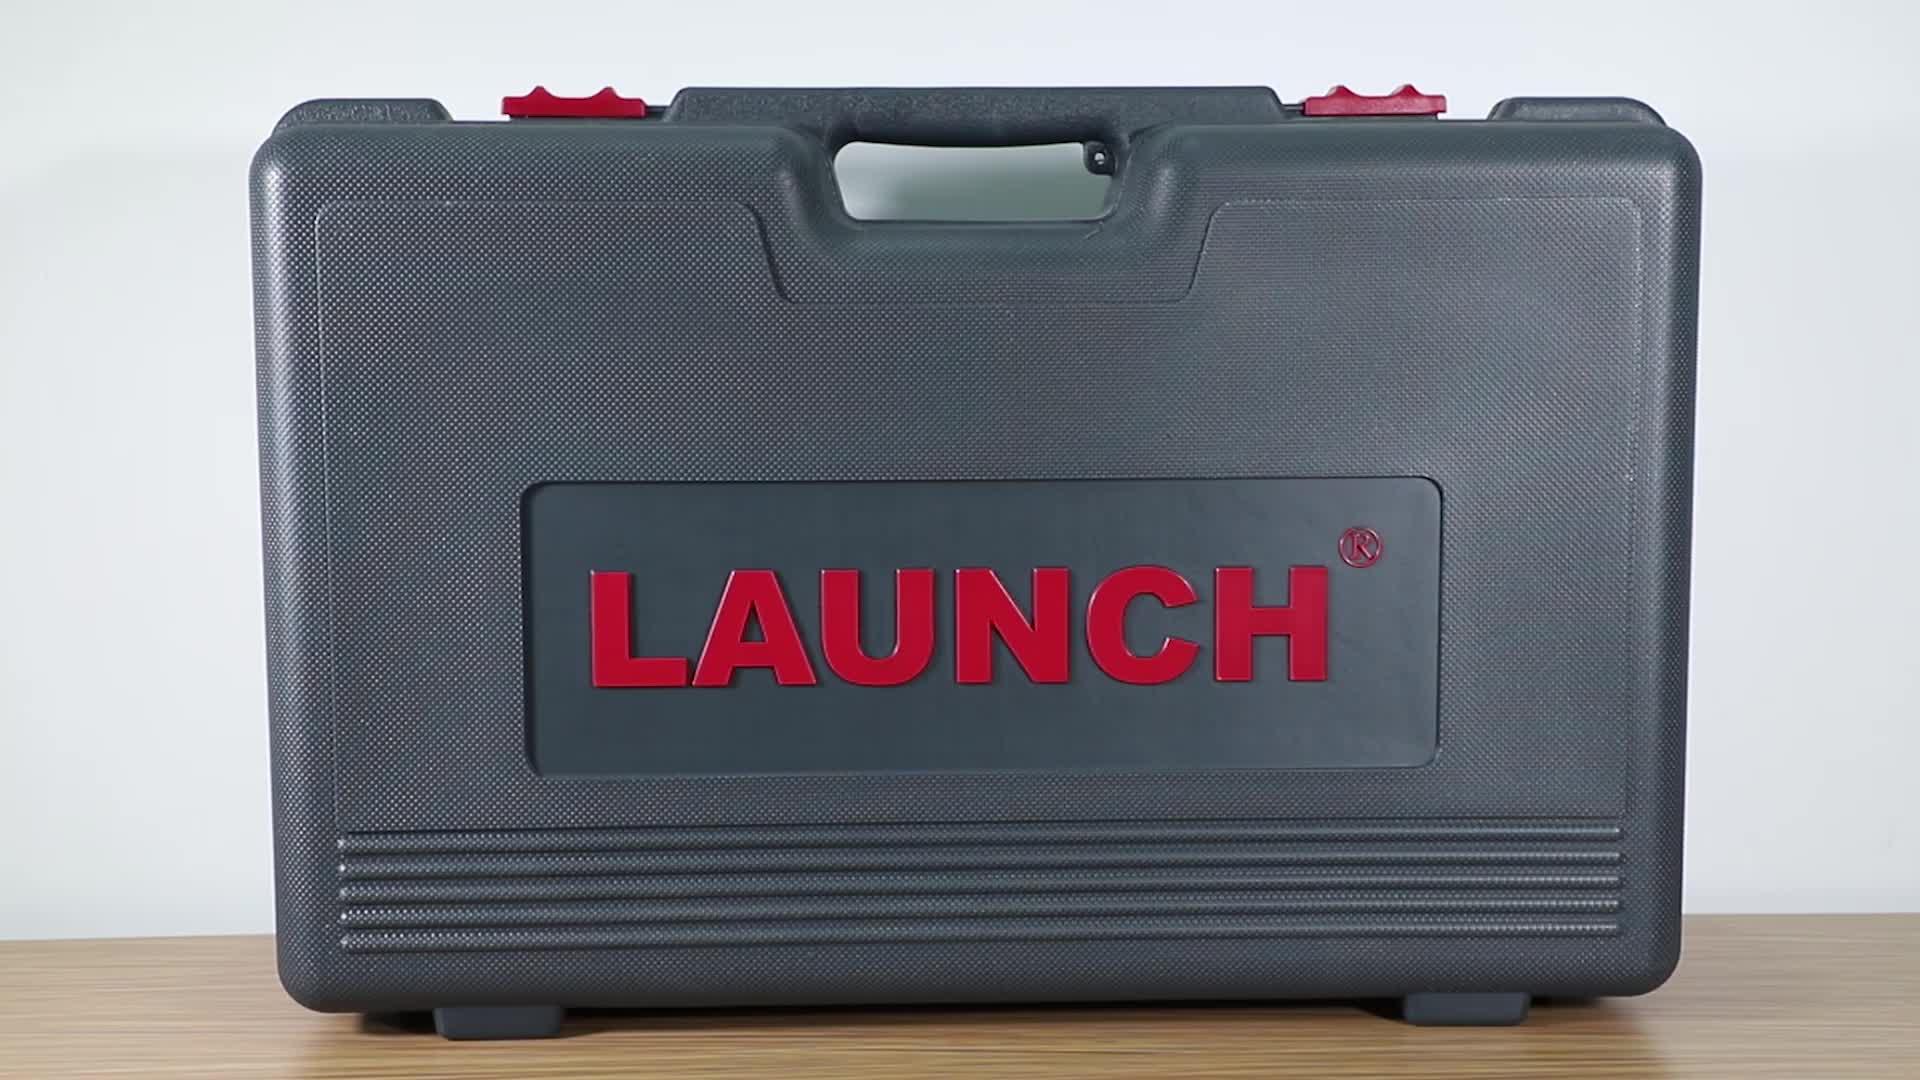 Original Launch diagnostic machine X431 V plus updated launch x431 pro3 Full System auto diagnostic scanner tool